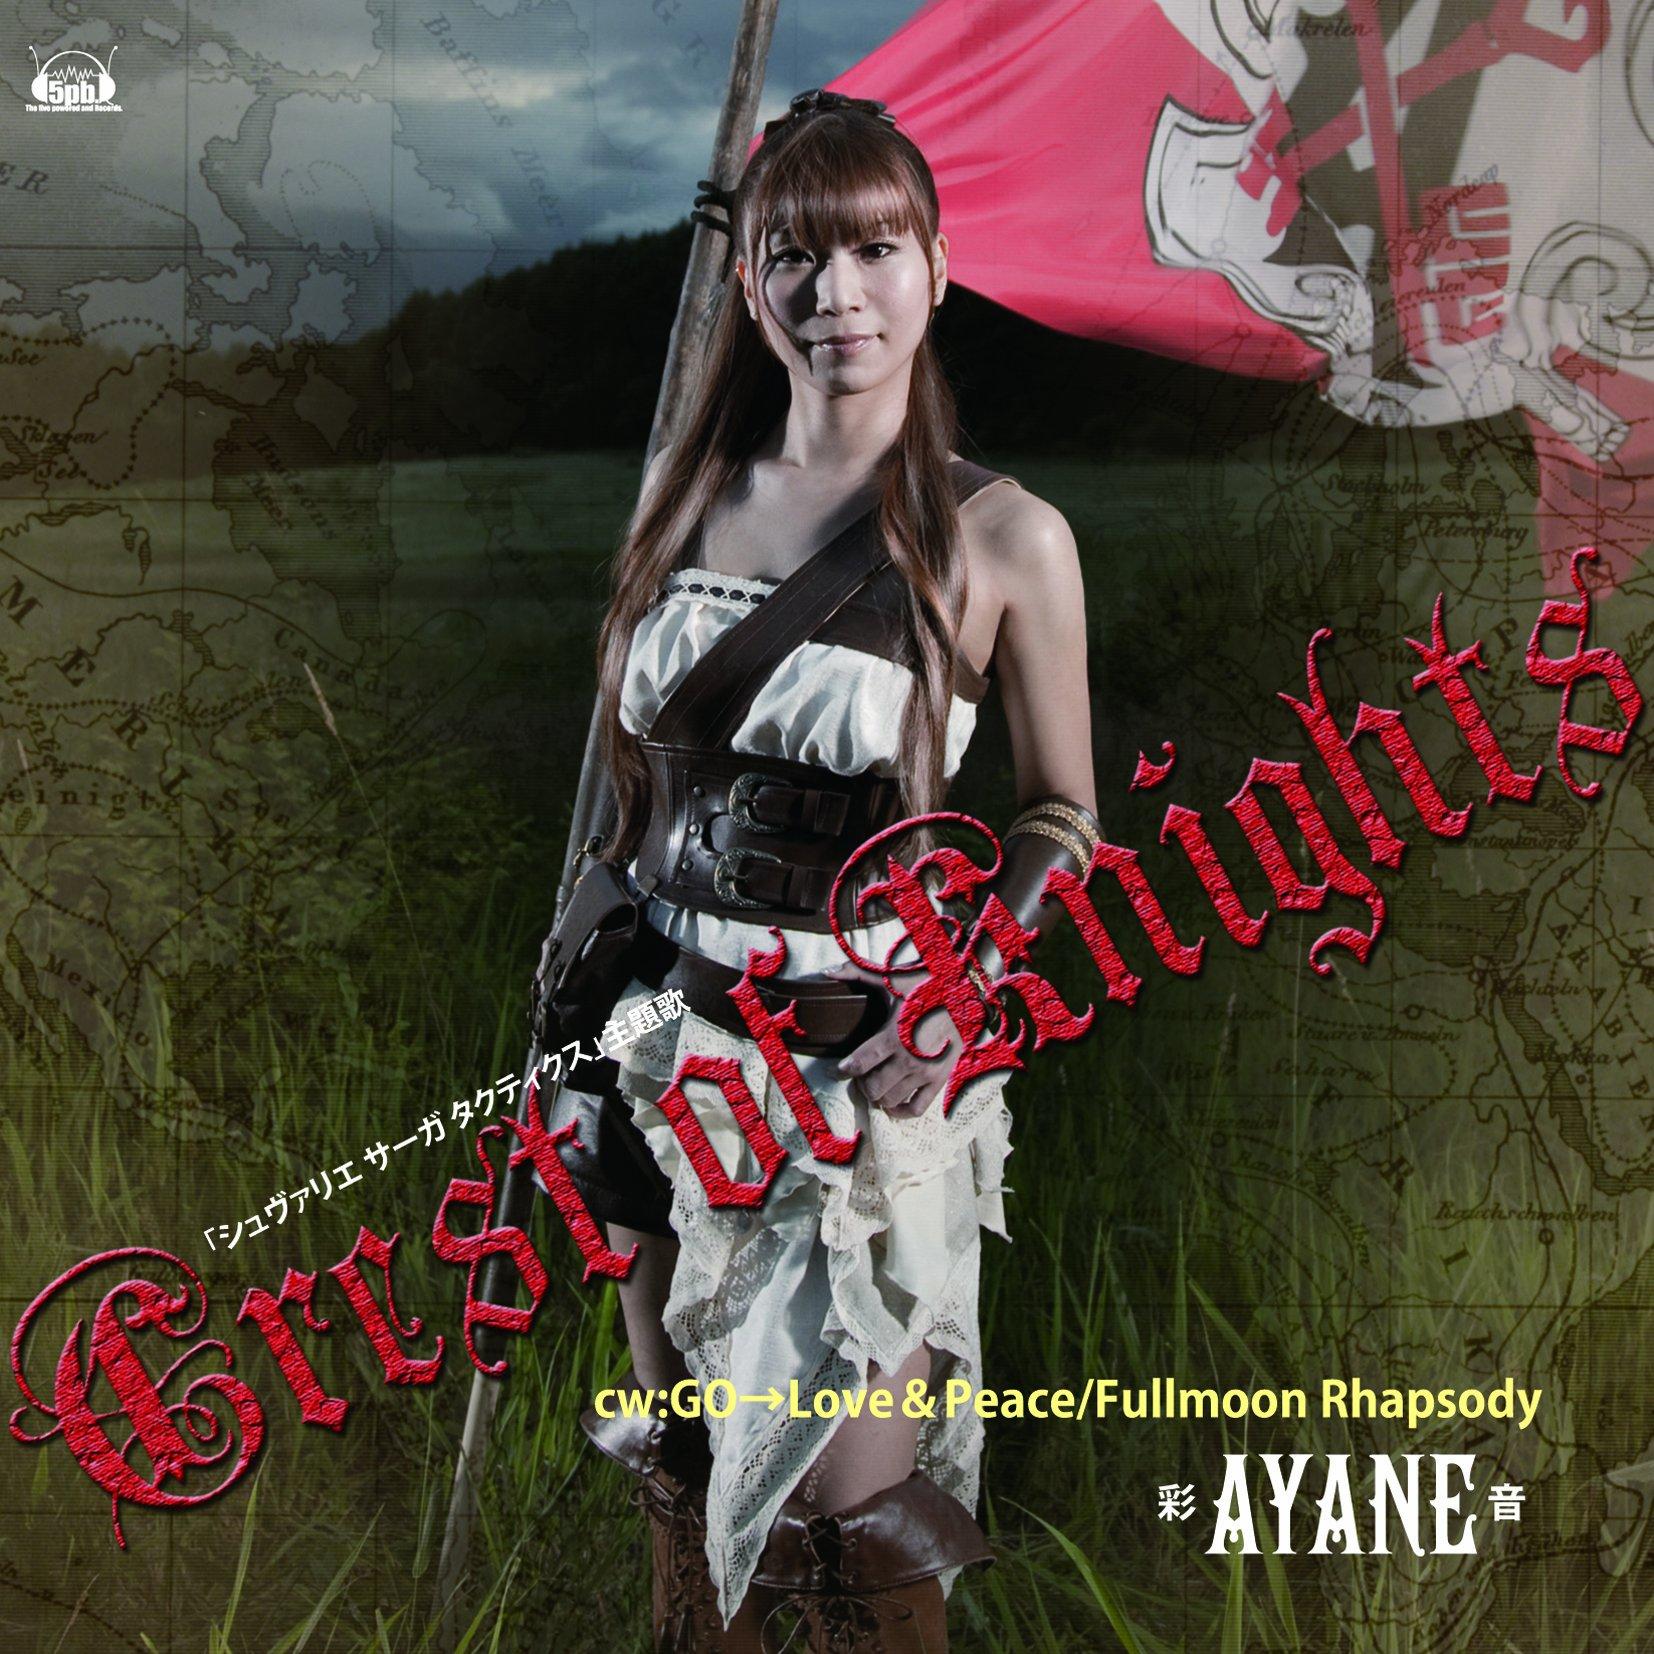 原版伴奏] Crest of Knights - 彩音 ...